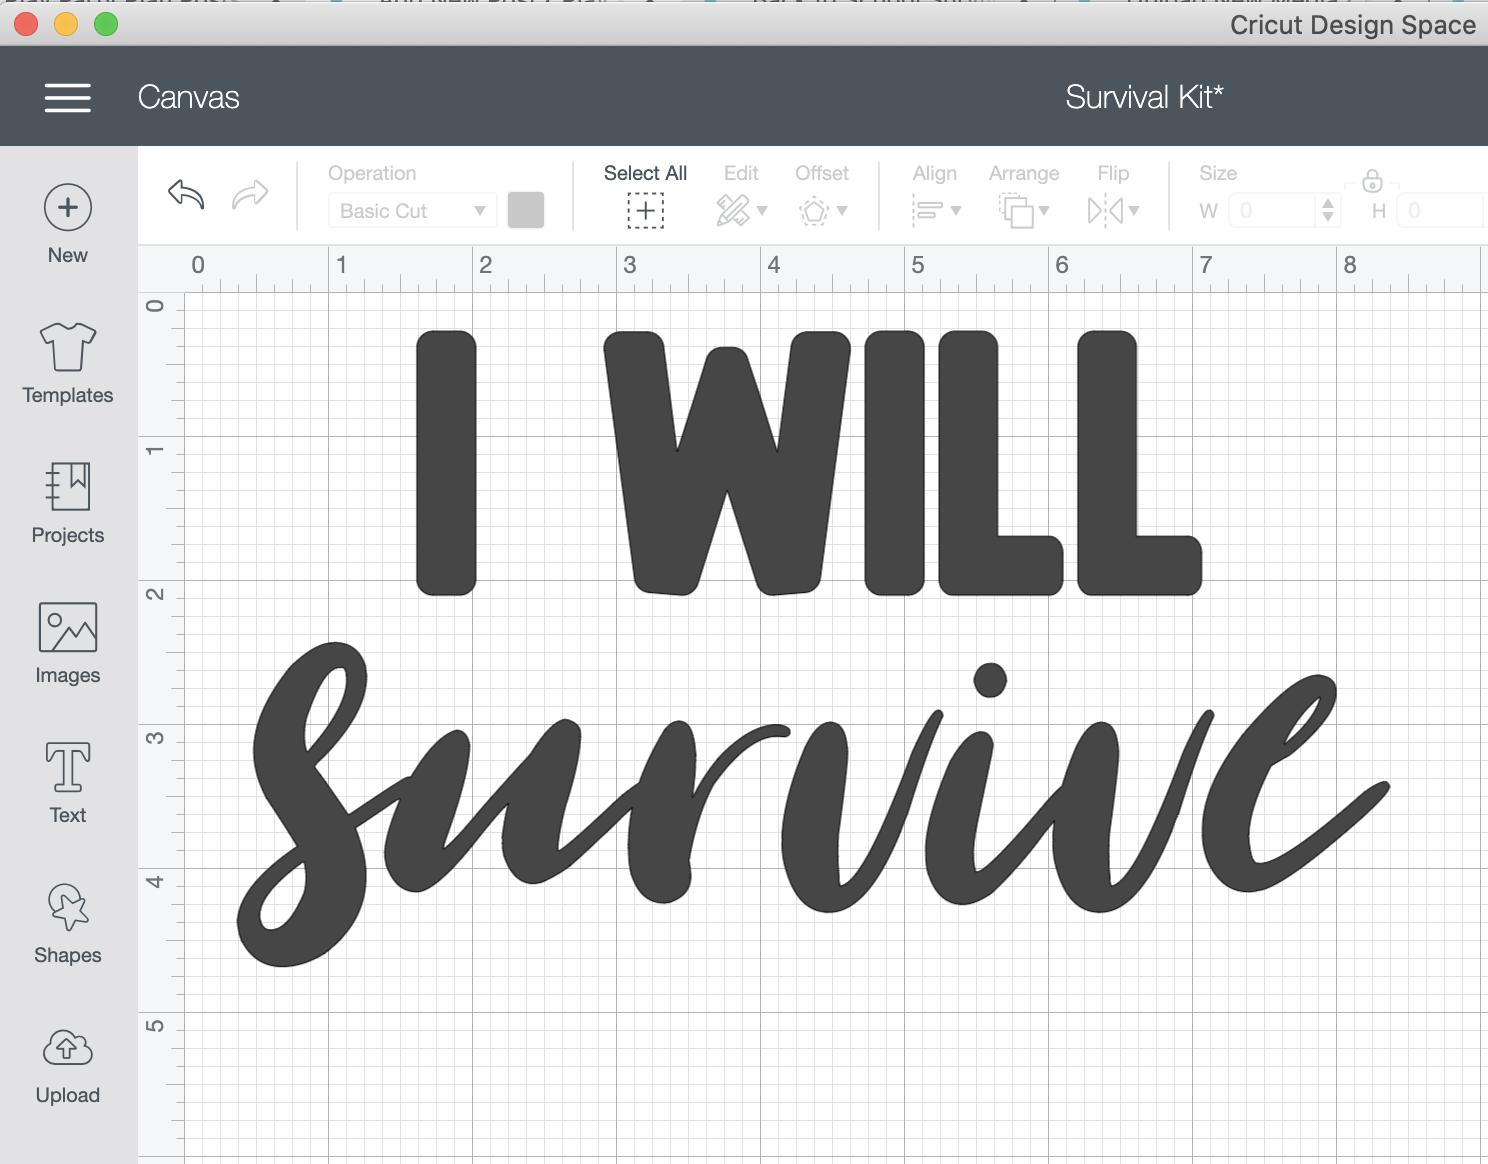 I will survive text in Cricut Design Space